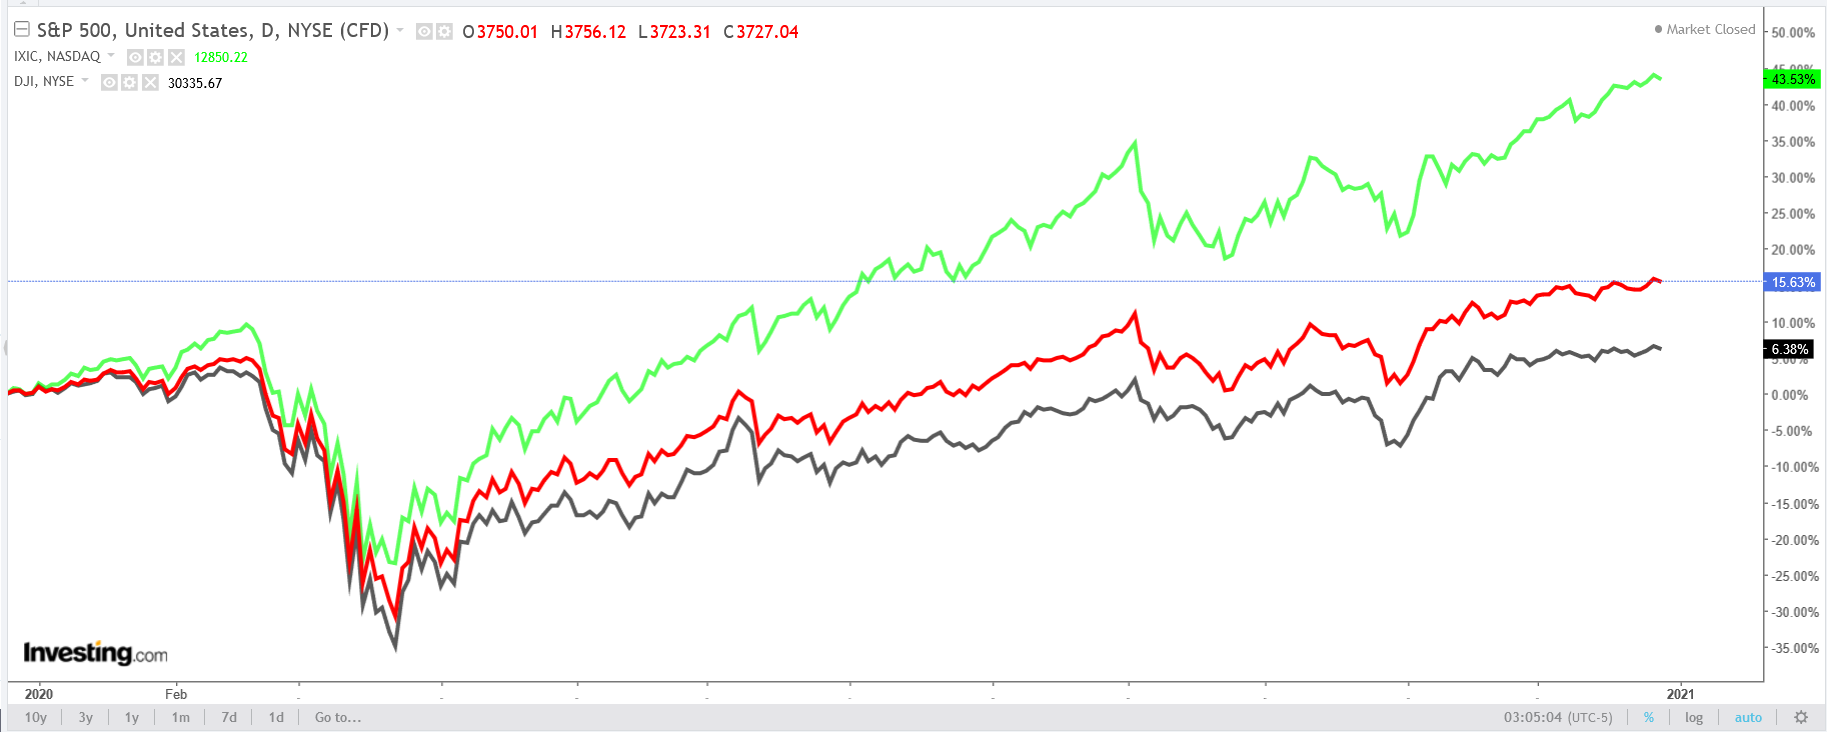 График Dow, S&P 500 и NASDAQ